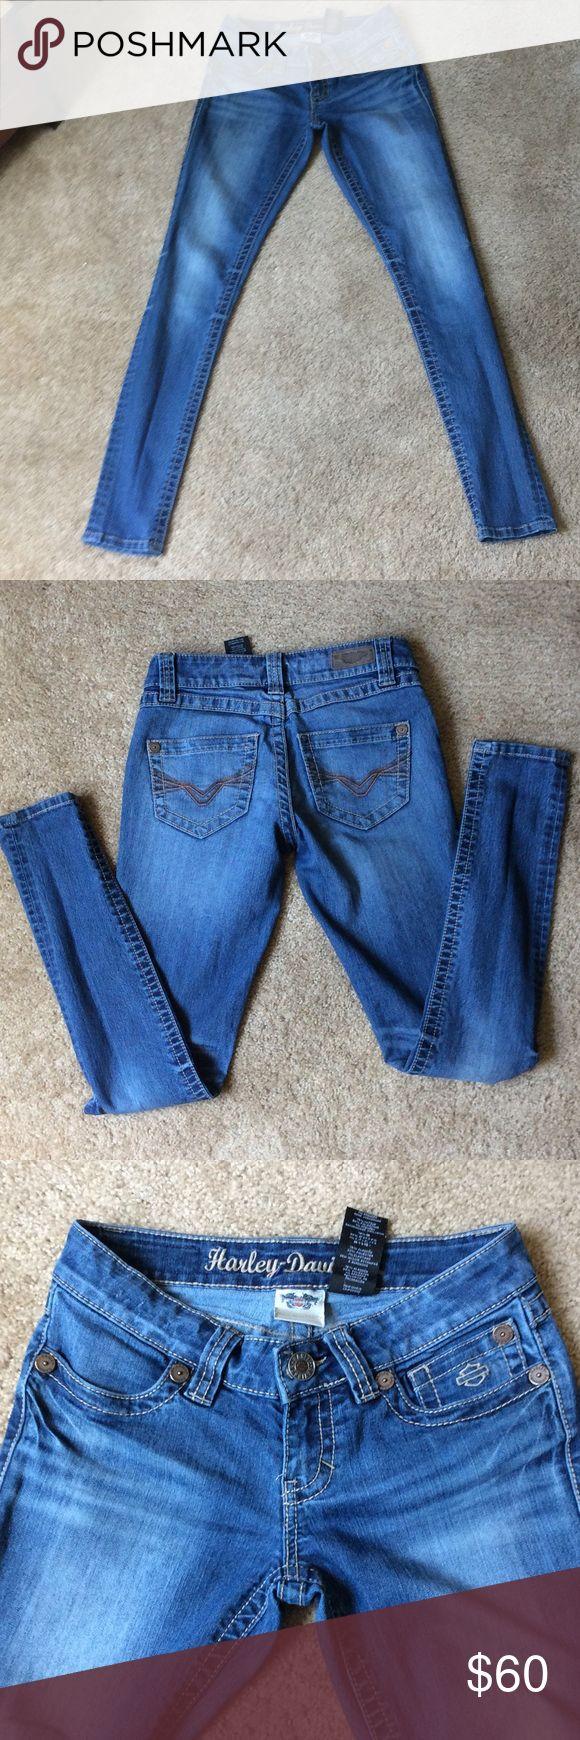 "Harley Davidson jeans Skinny stretch new condition size 2 ,inseam 30"" Harley-Davidson Jeans Skinny"